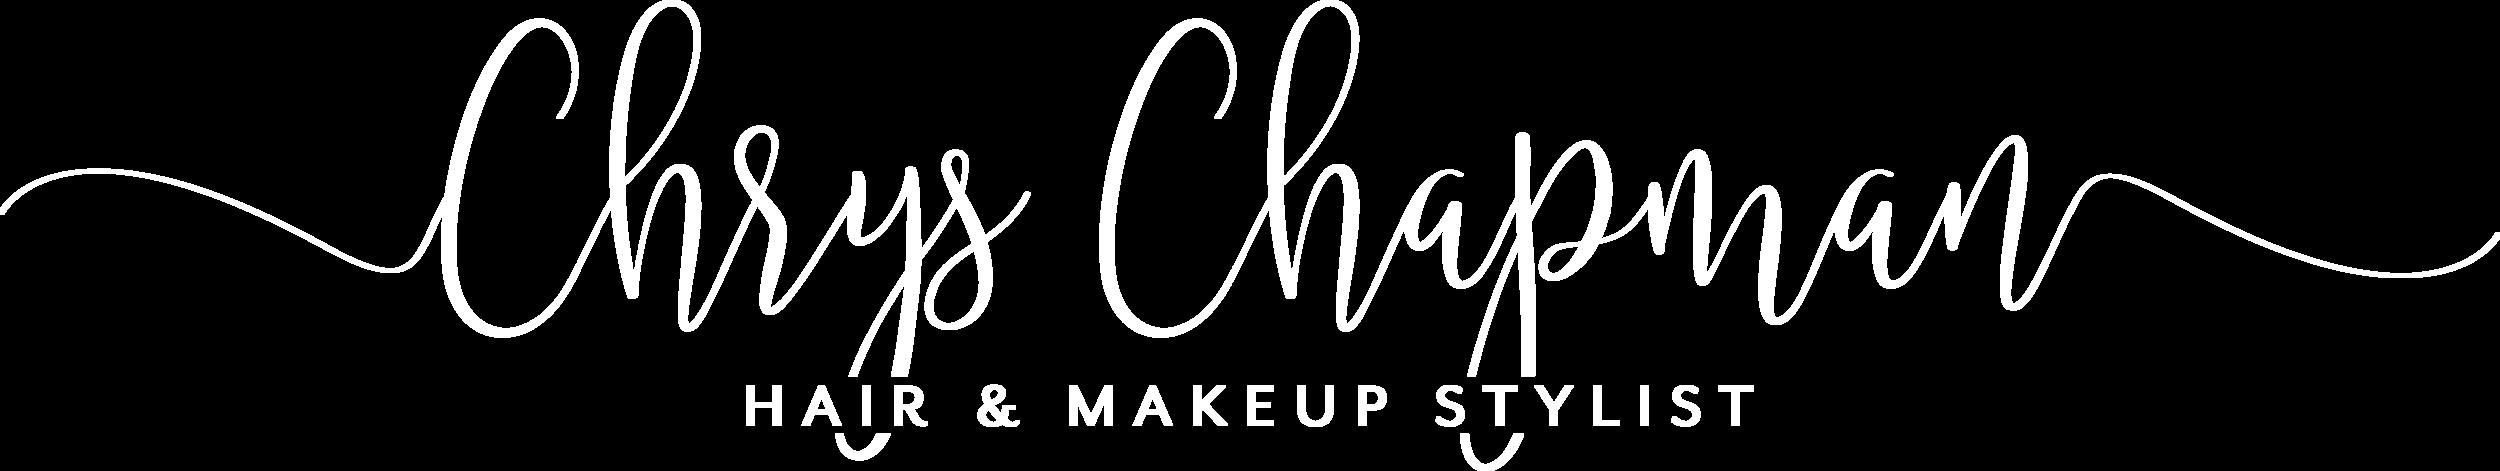 CC_logo1_white_HighRes.png